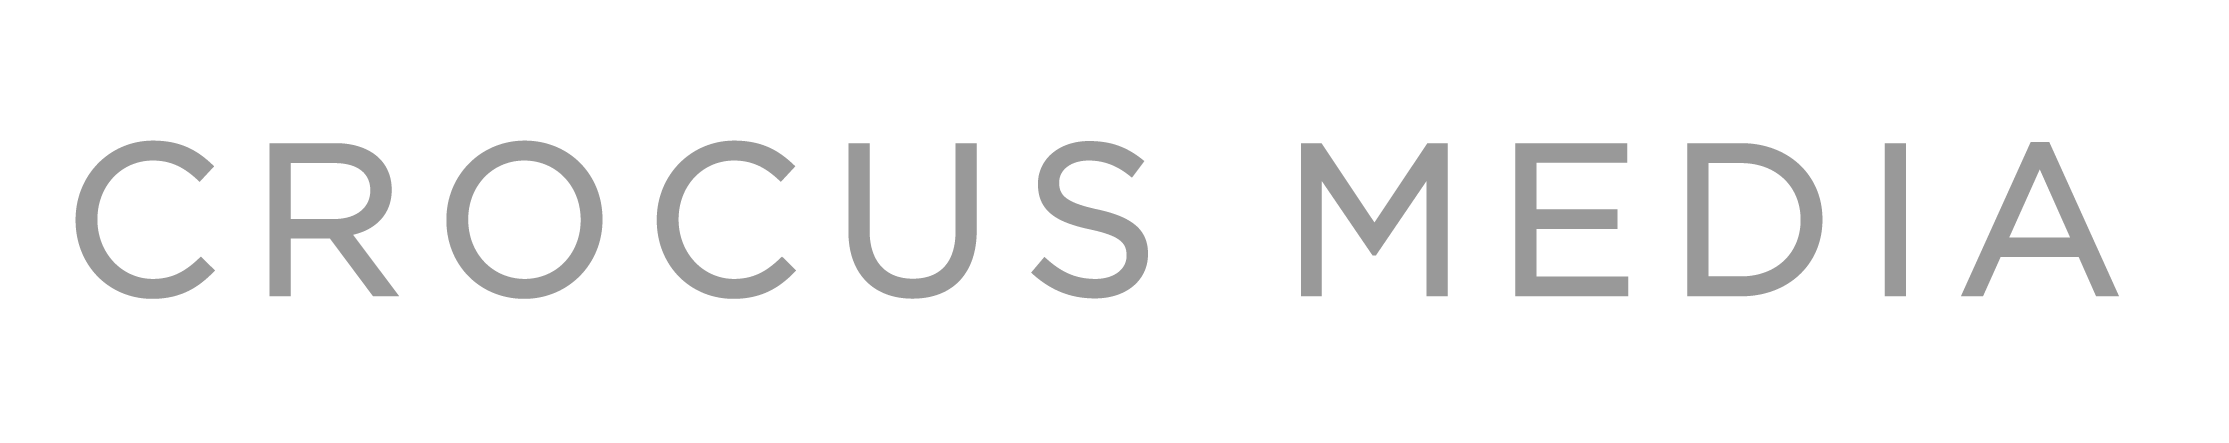 CROCUSMEDIA_Logo_WHITE